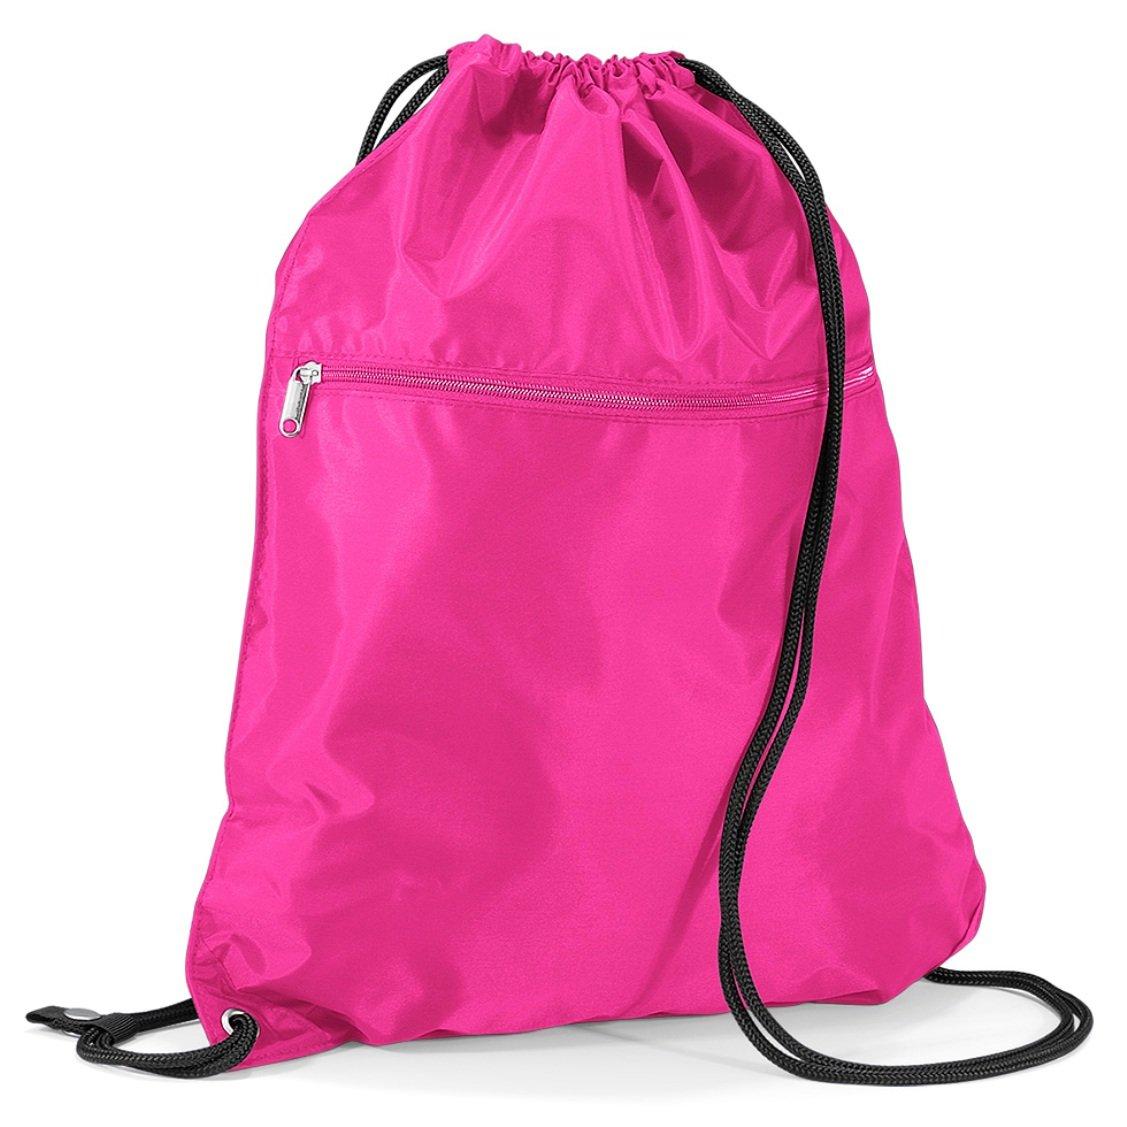 Quadra Senior Gymsac Quadra Bags, Backpacks Etc QD71